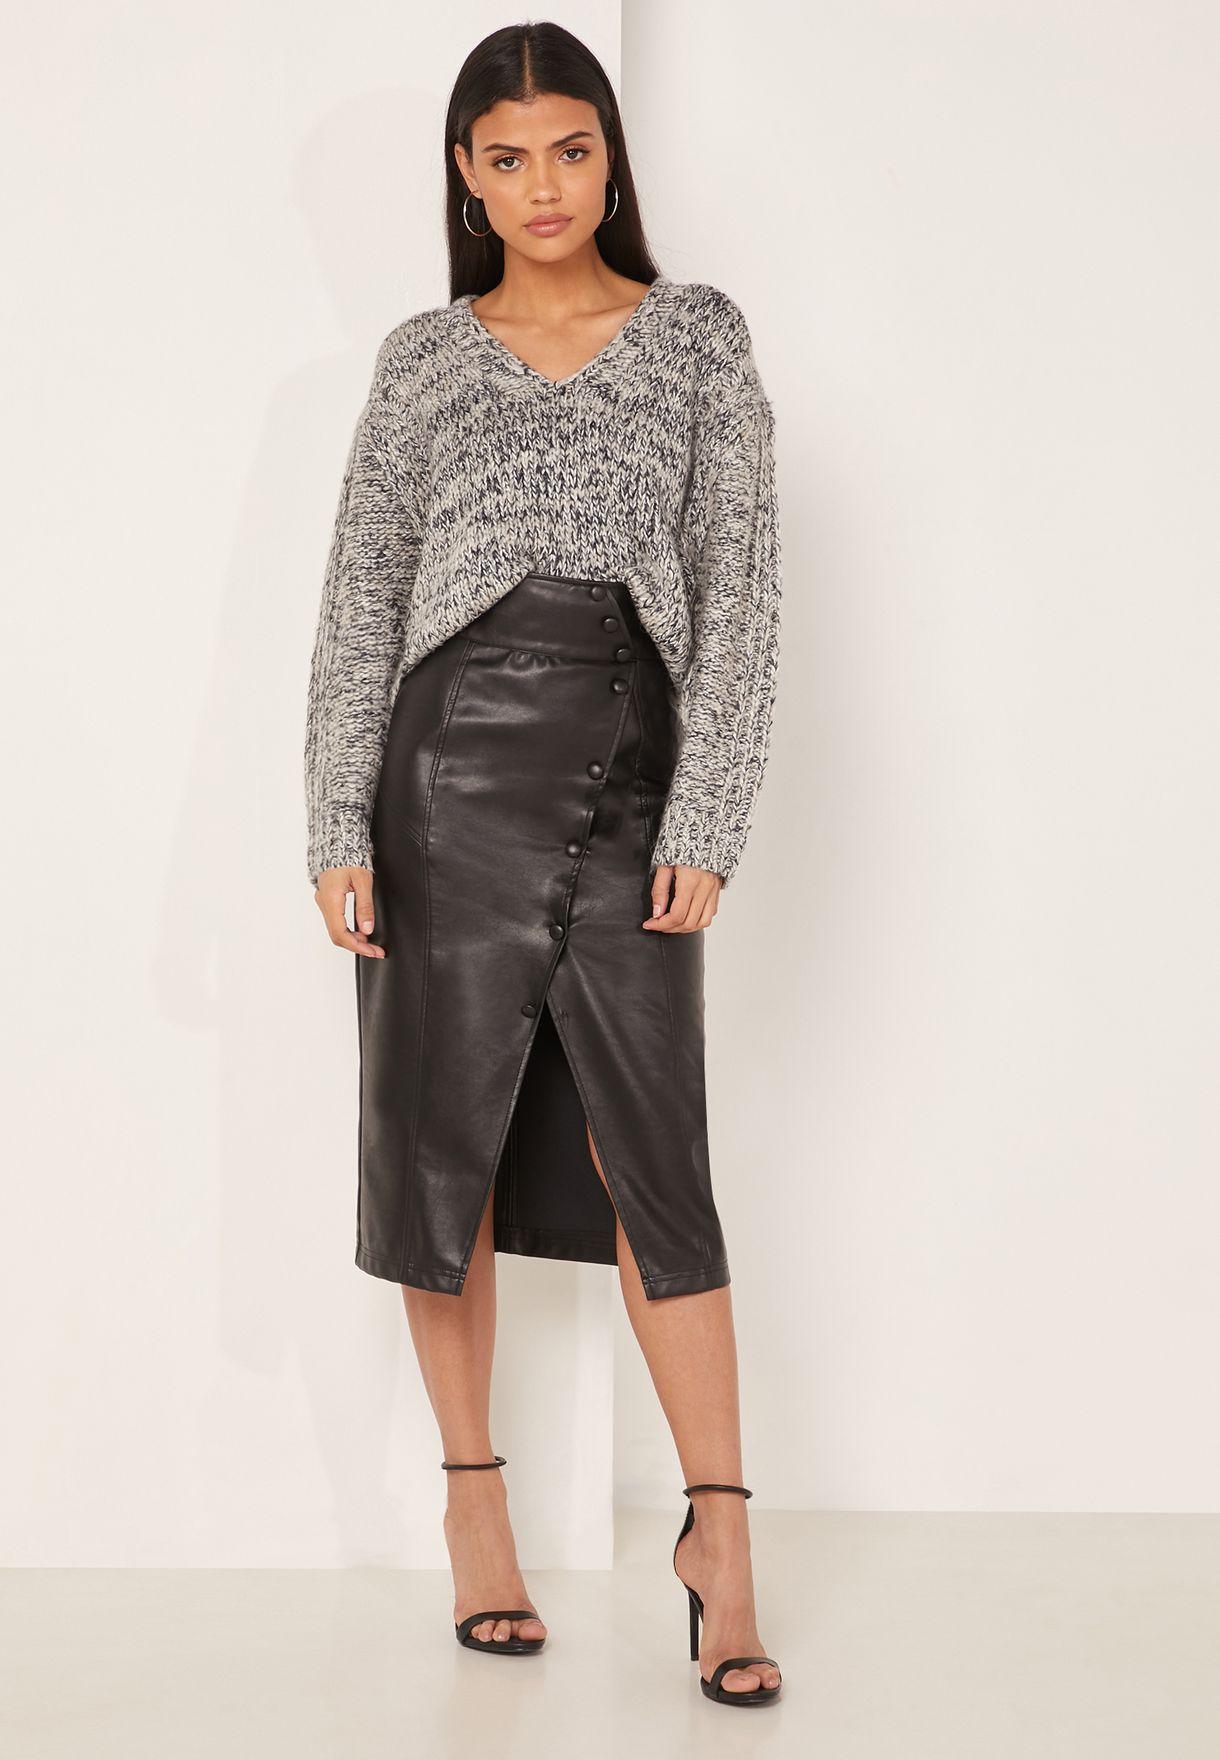 Flo Textured V- Neck Sweater